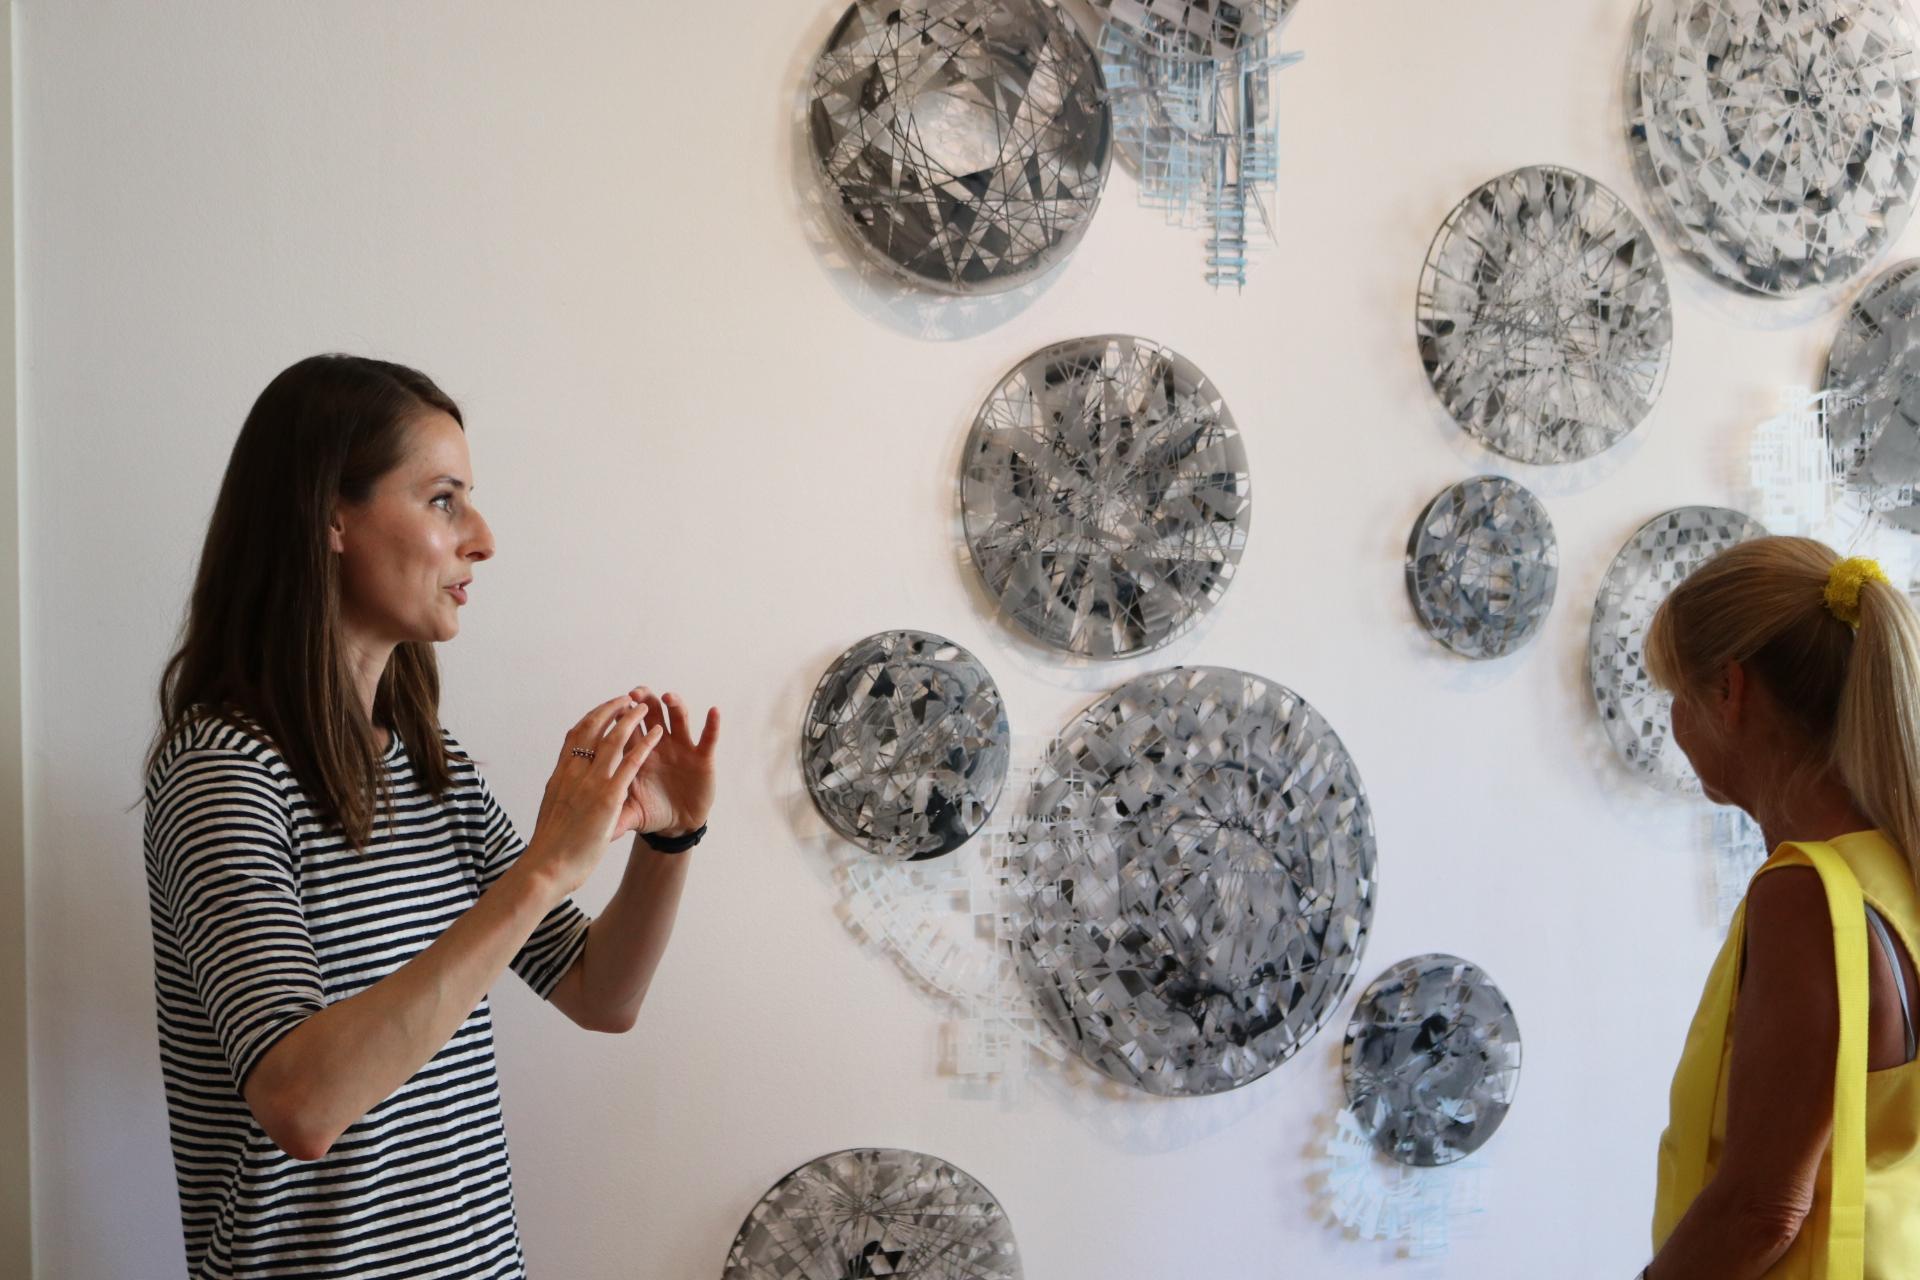 Gallery talk at Projektraum, Friedrichshafen, Germany